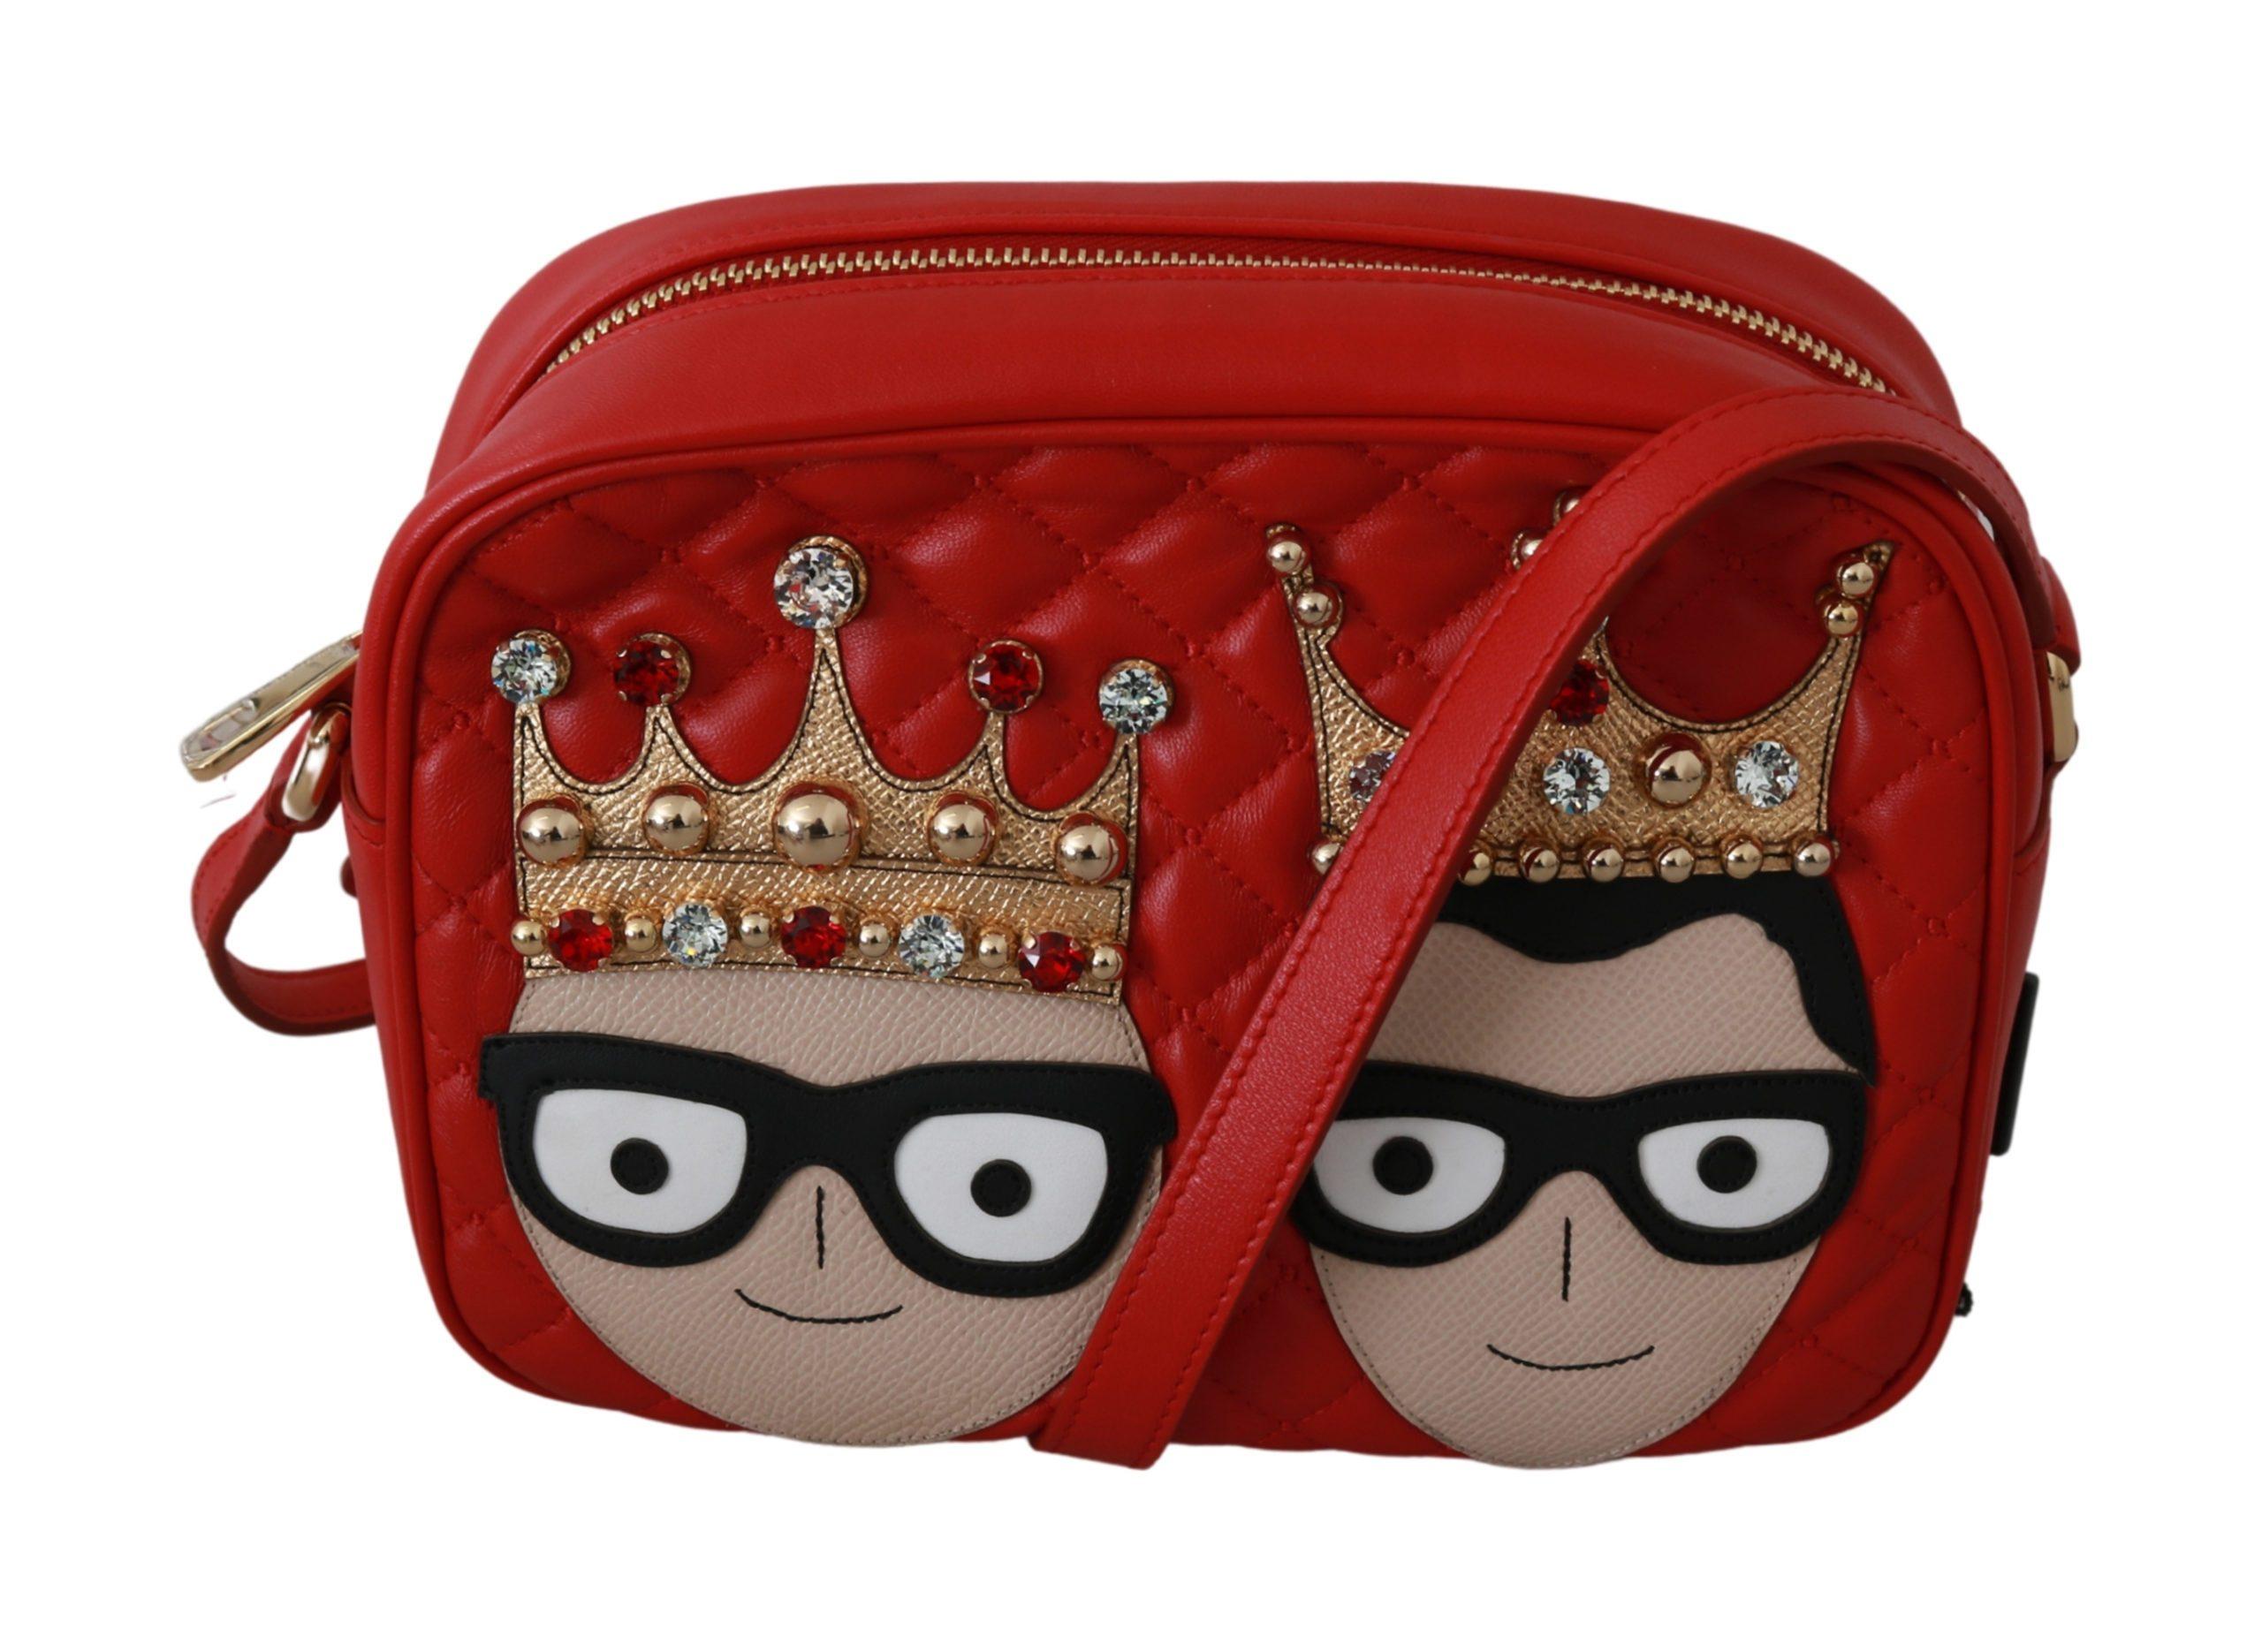 Dolce & Gabbana Women's Crown Patch Crossbody Bag Red VAS9202